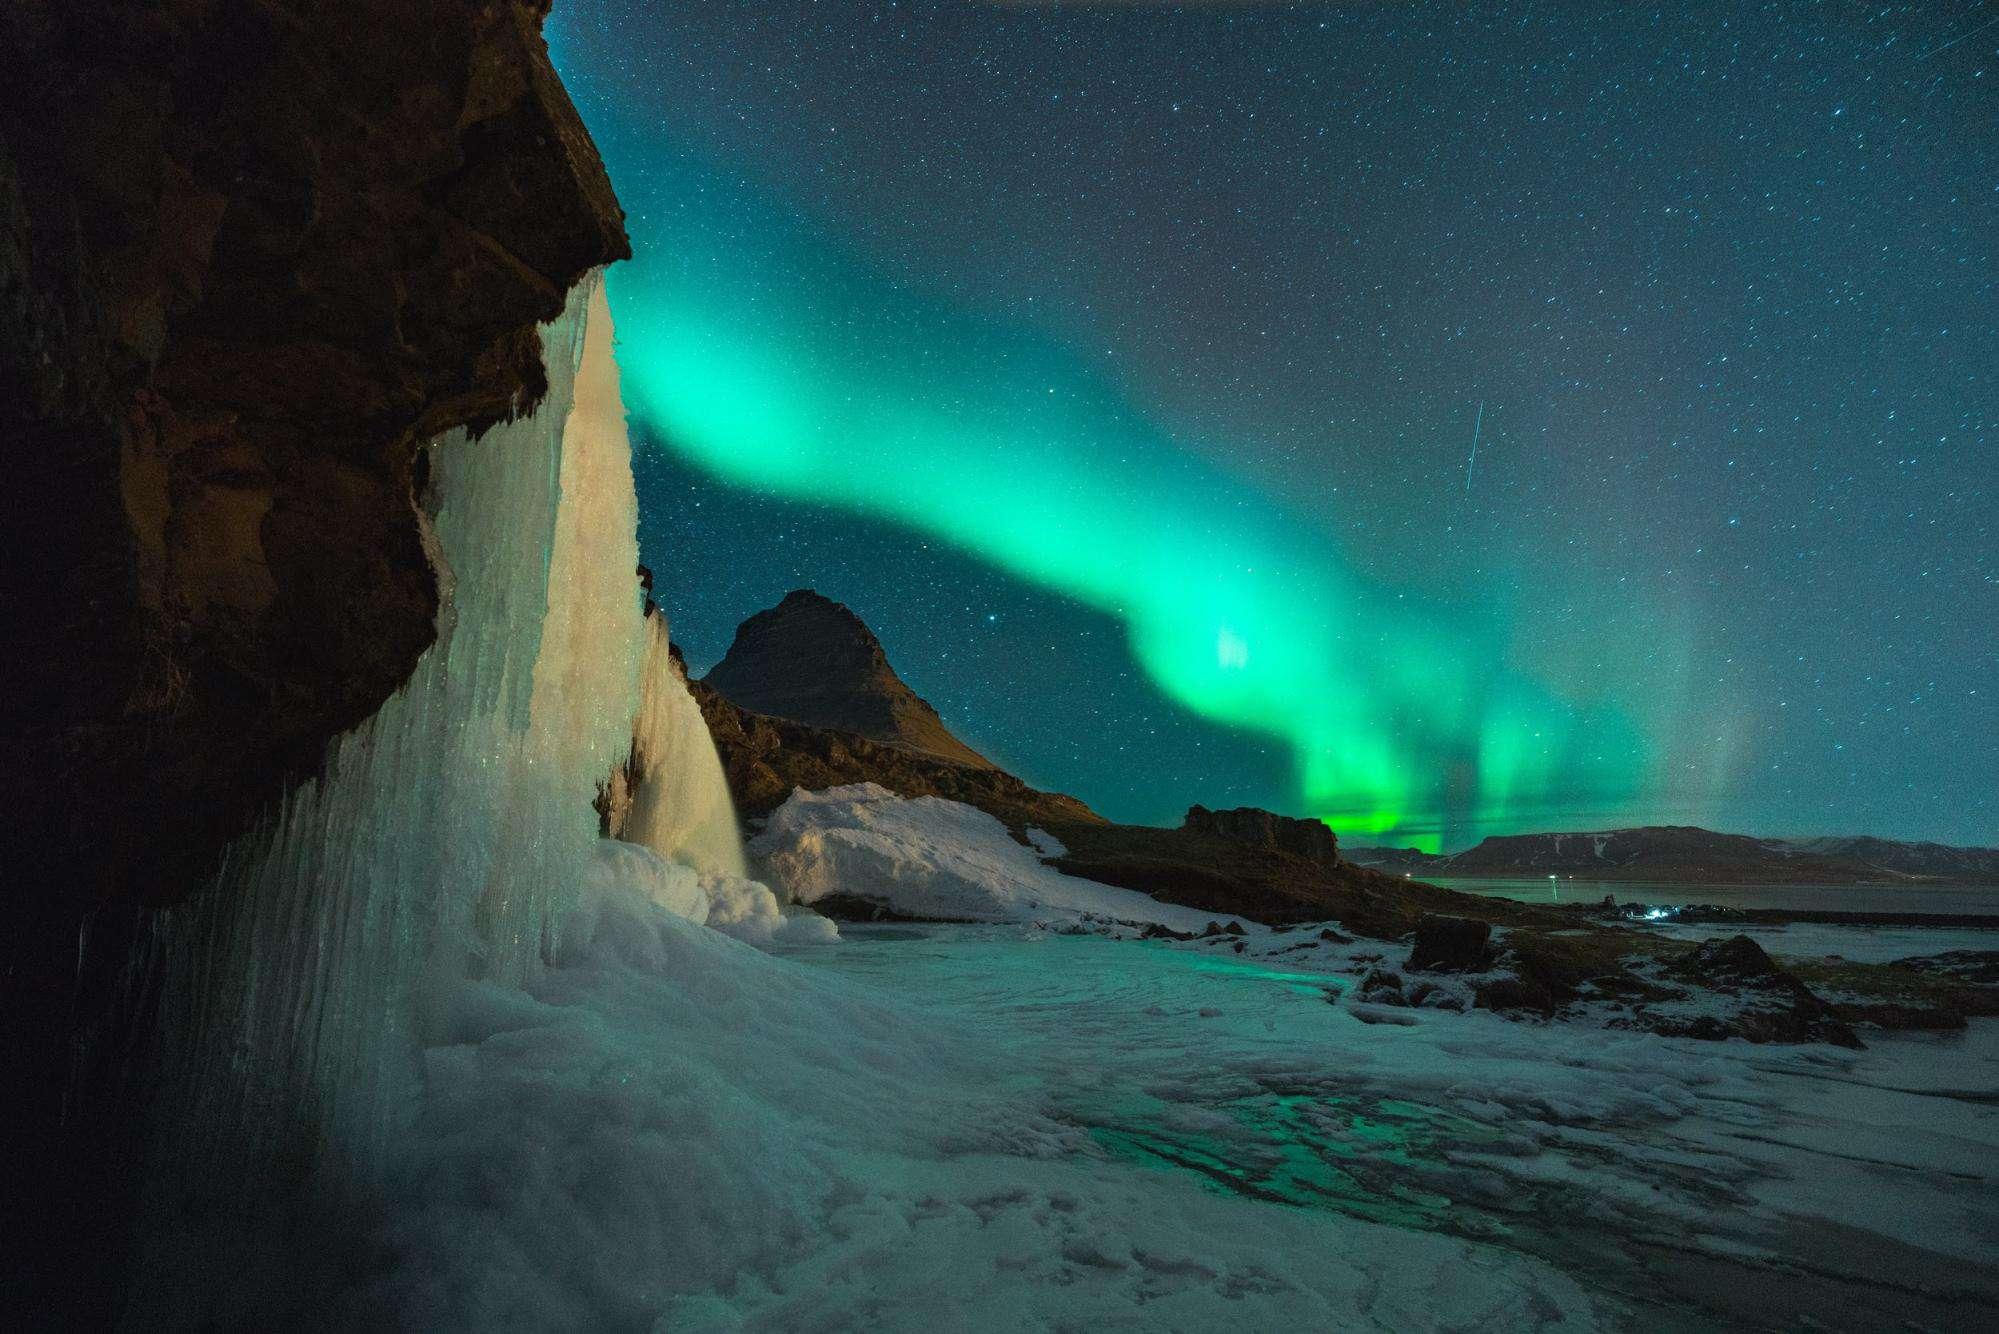 Best Lens For Astrophotography | DSLR Camera Night Sky Lenses